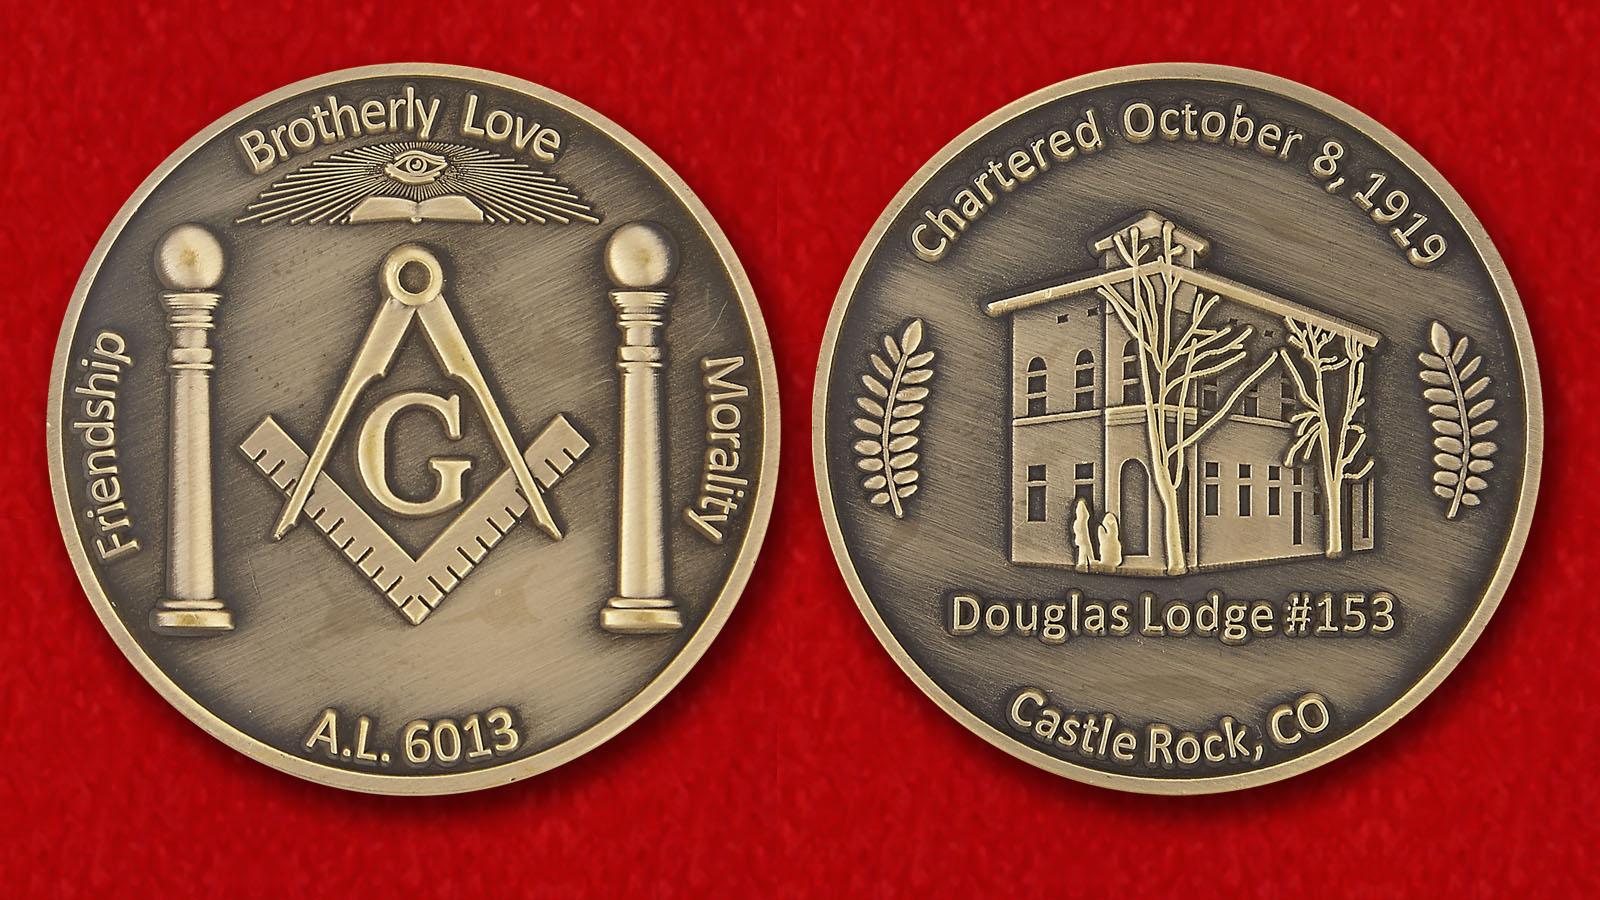 Douglas Lorge # 153 Castle Rock, Colorado Challenge Coin - obverse and reverse